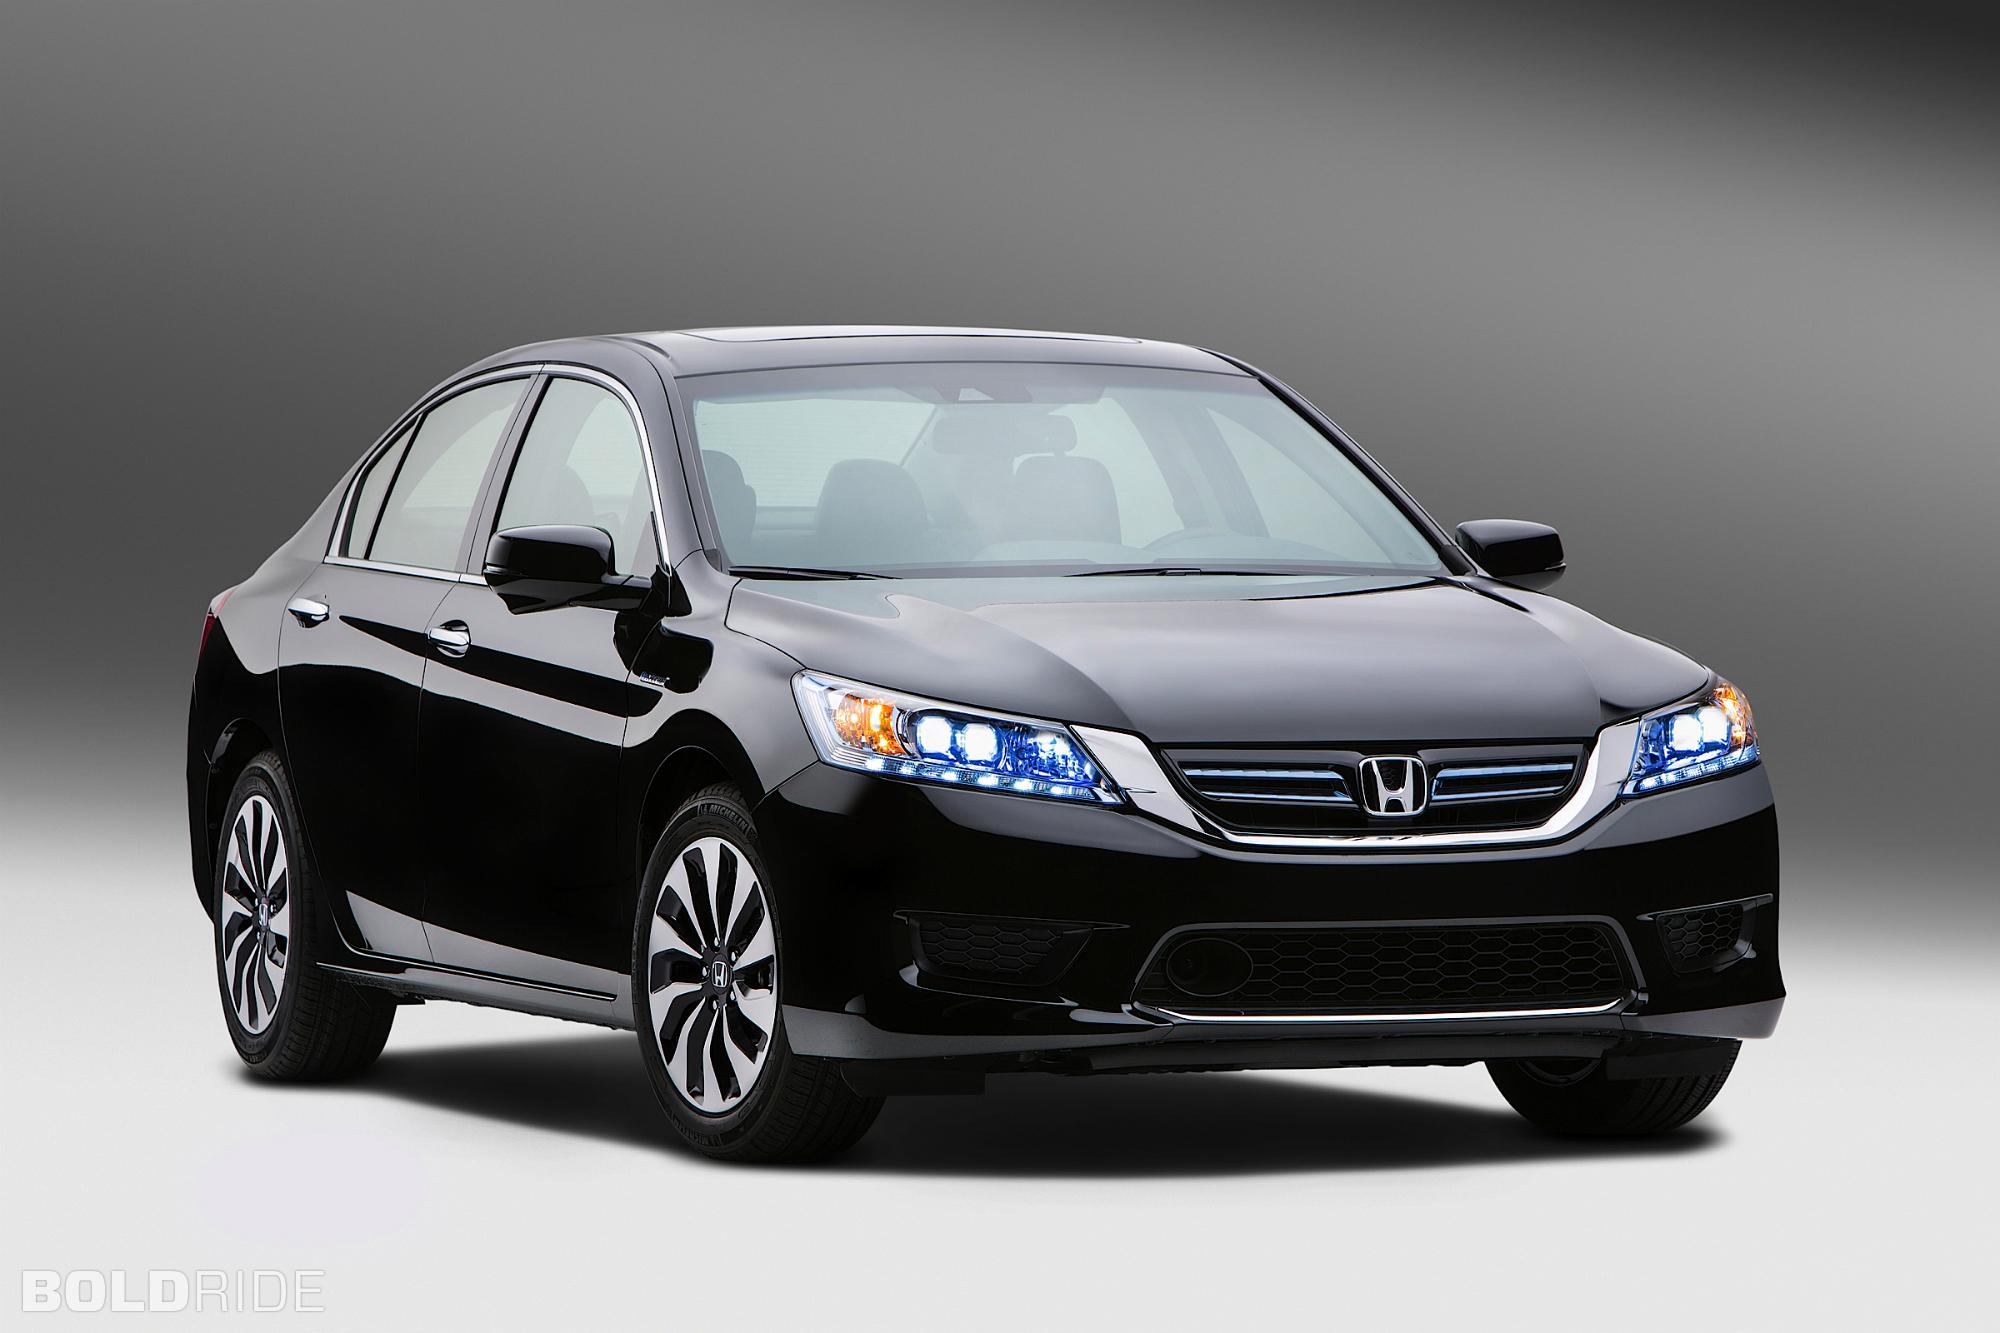 2014 Honda Accord Hybrid 1920 x 1080